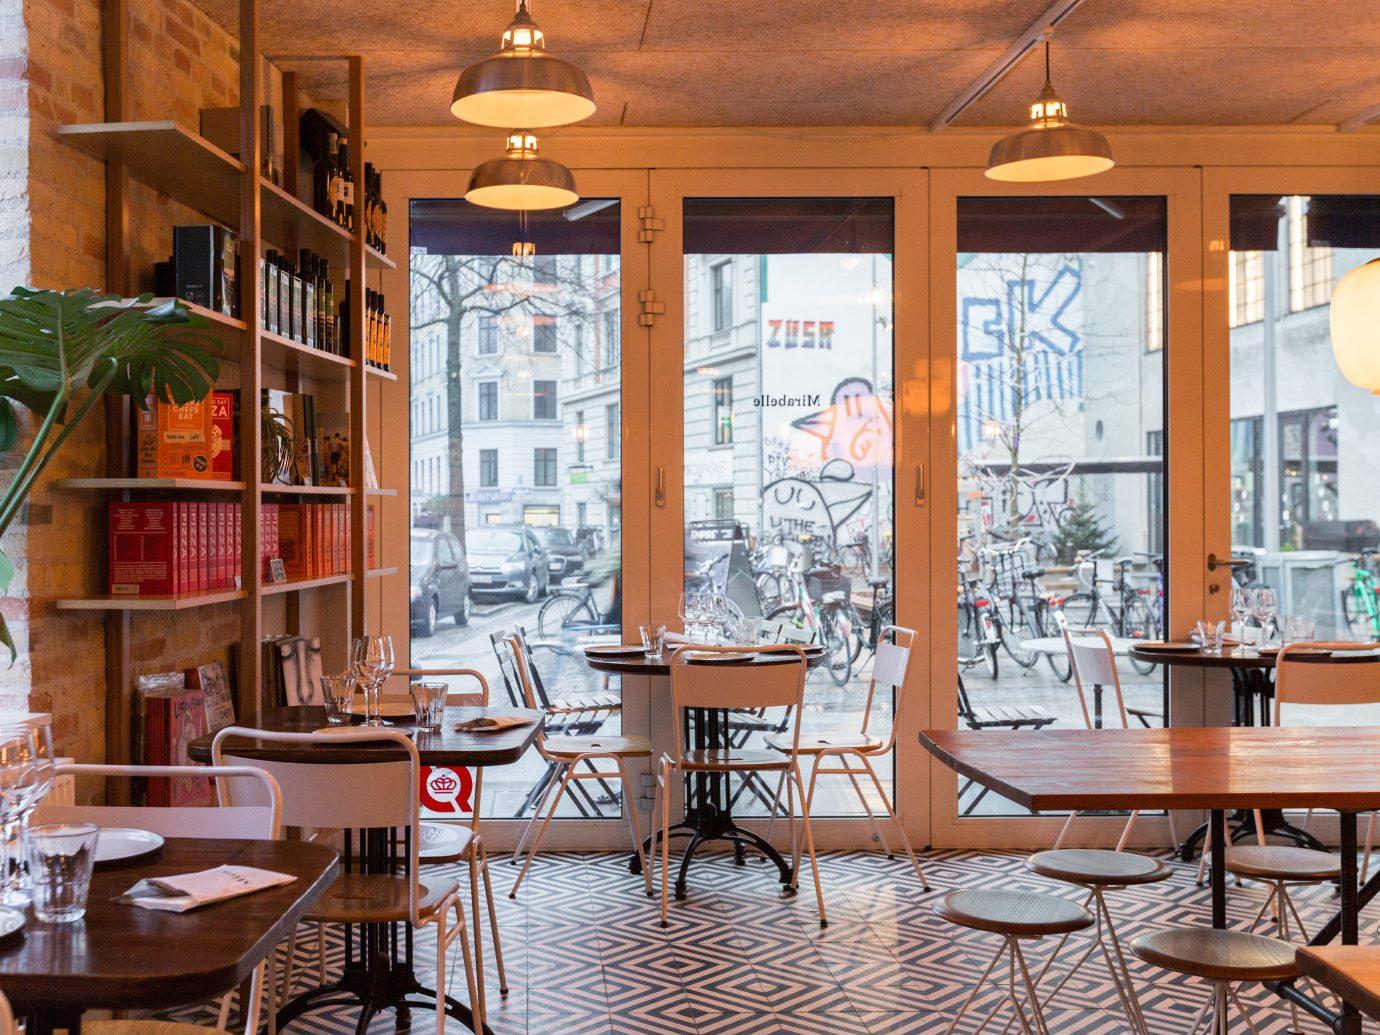 Copenhagen Denmark Trip Ideas table chair indoor restaurant interior design window café furniture Dining coffeehouse dining room area dining table